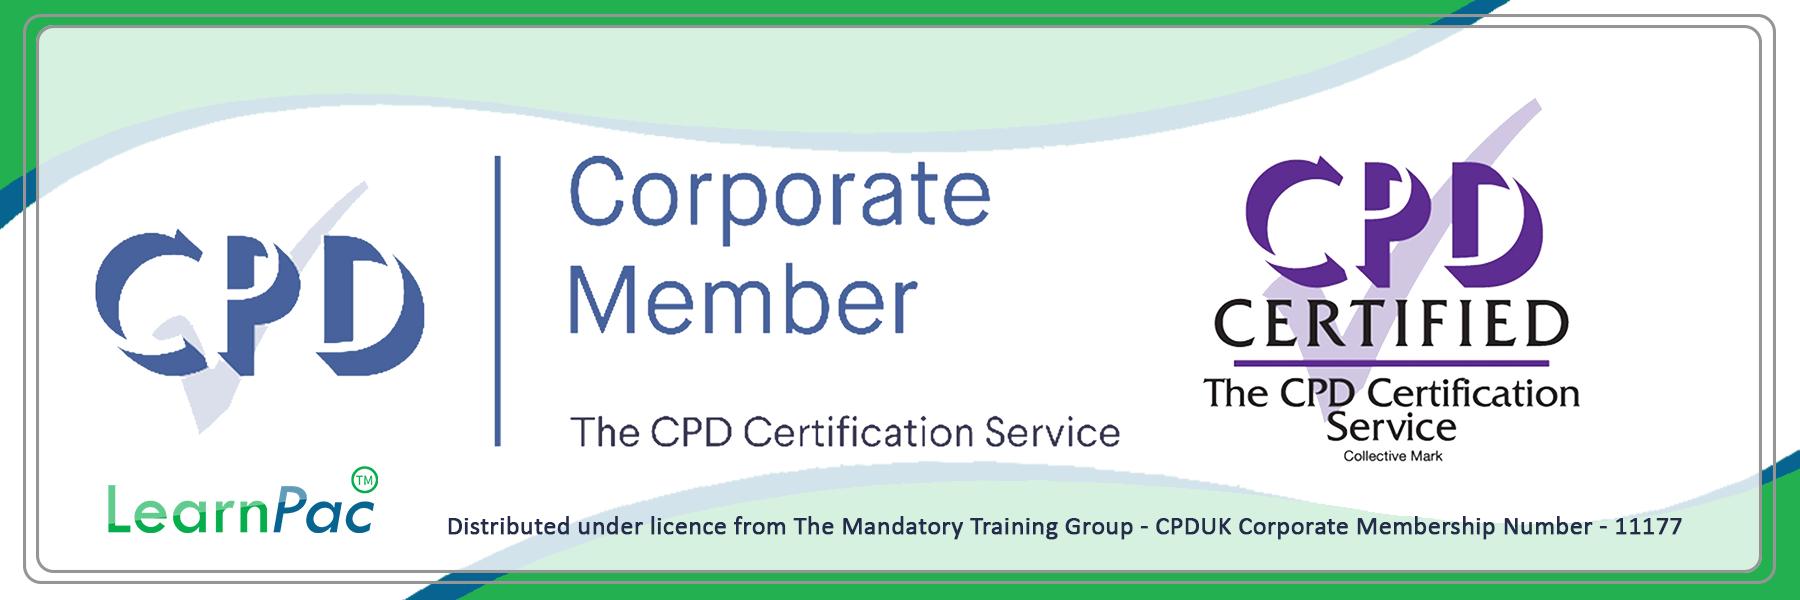 Care Certificate Standard 11 - CPDUK Certified - Learnpac System UK -